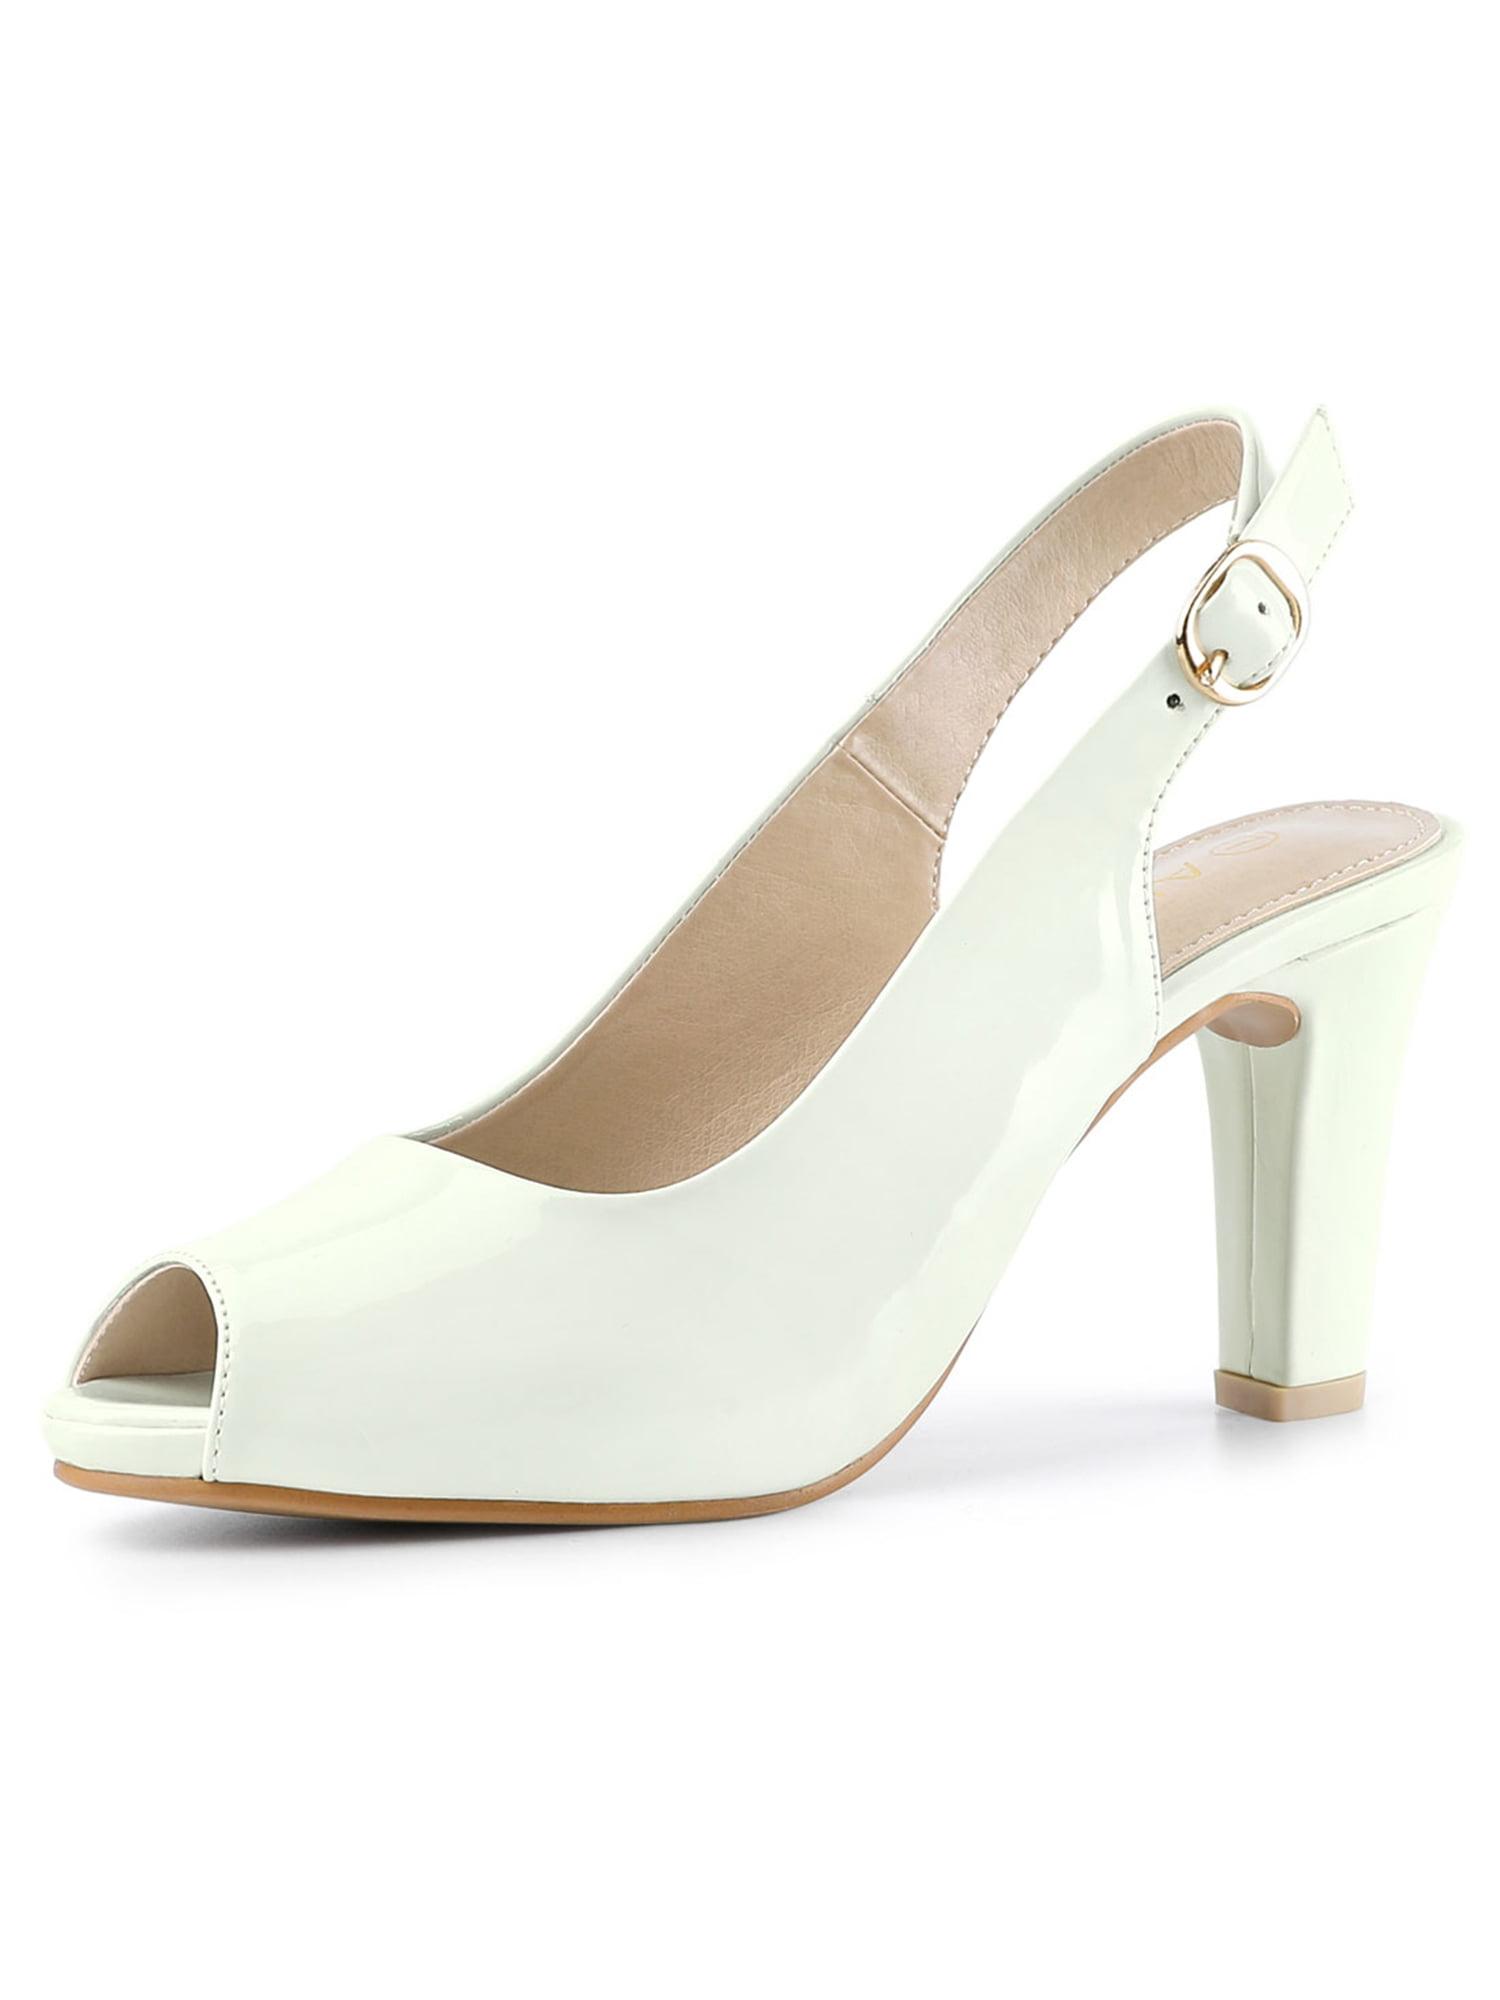 Women's Peep Toe Ankle Strap Slingback